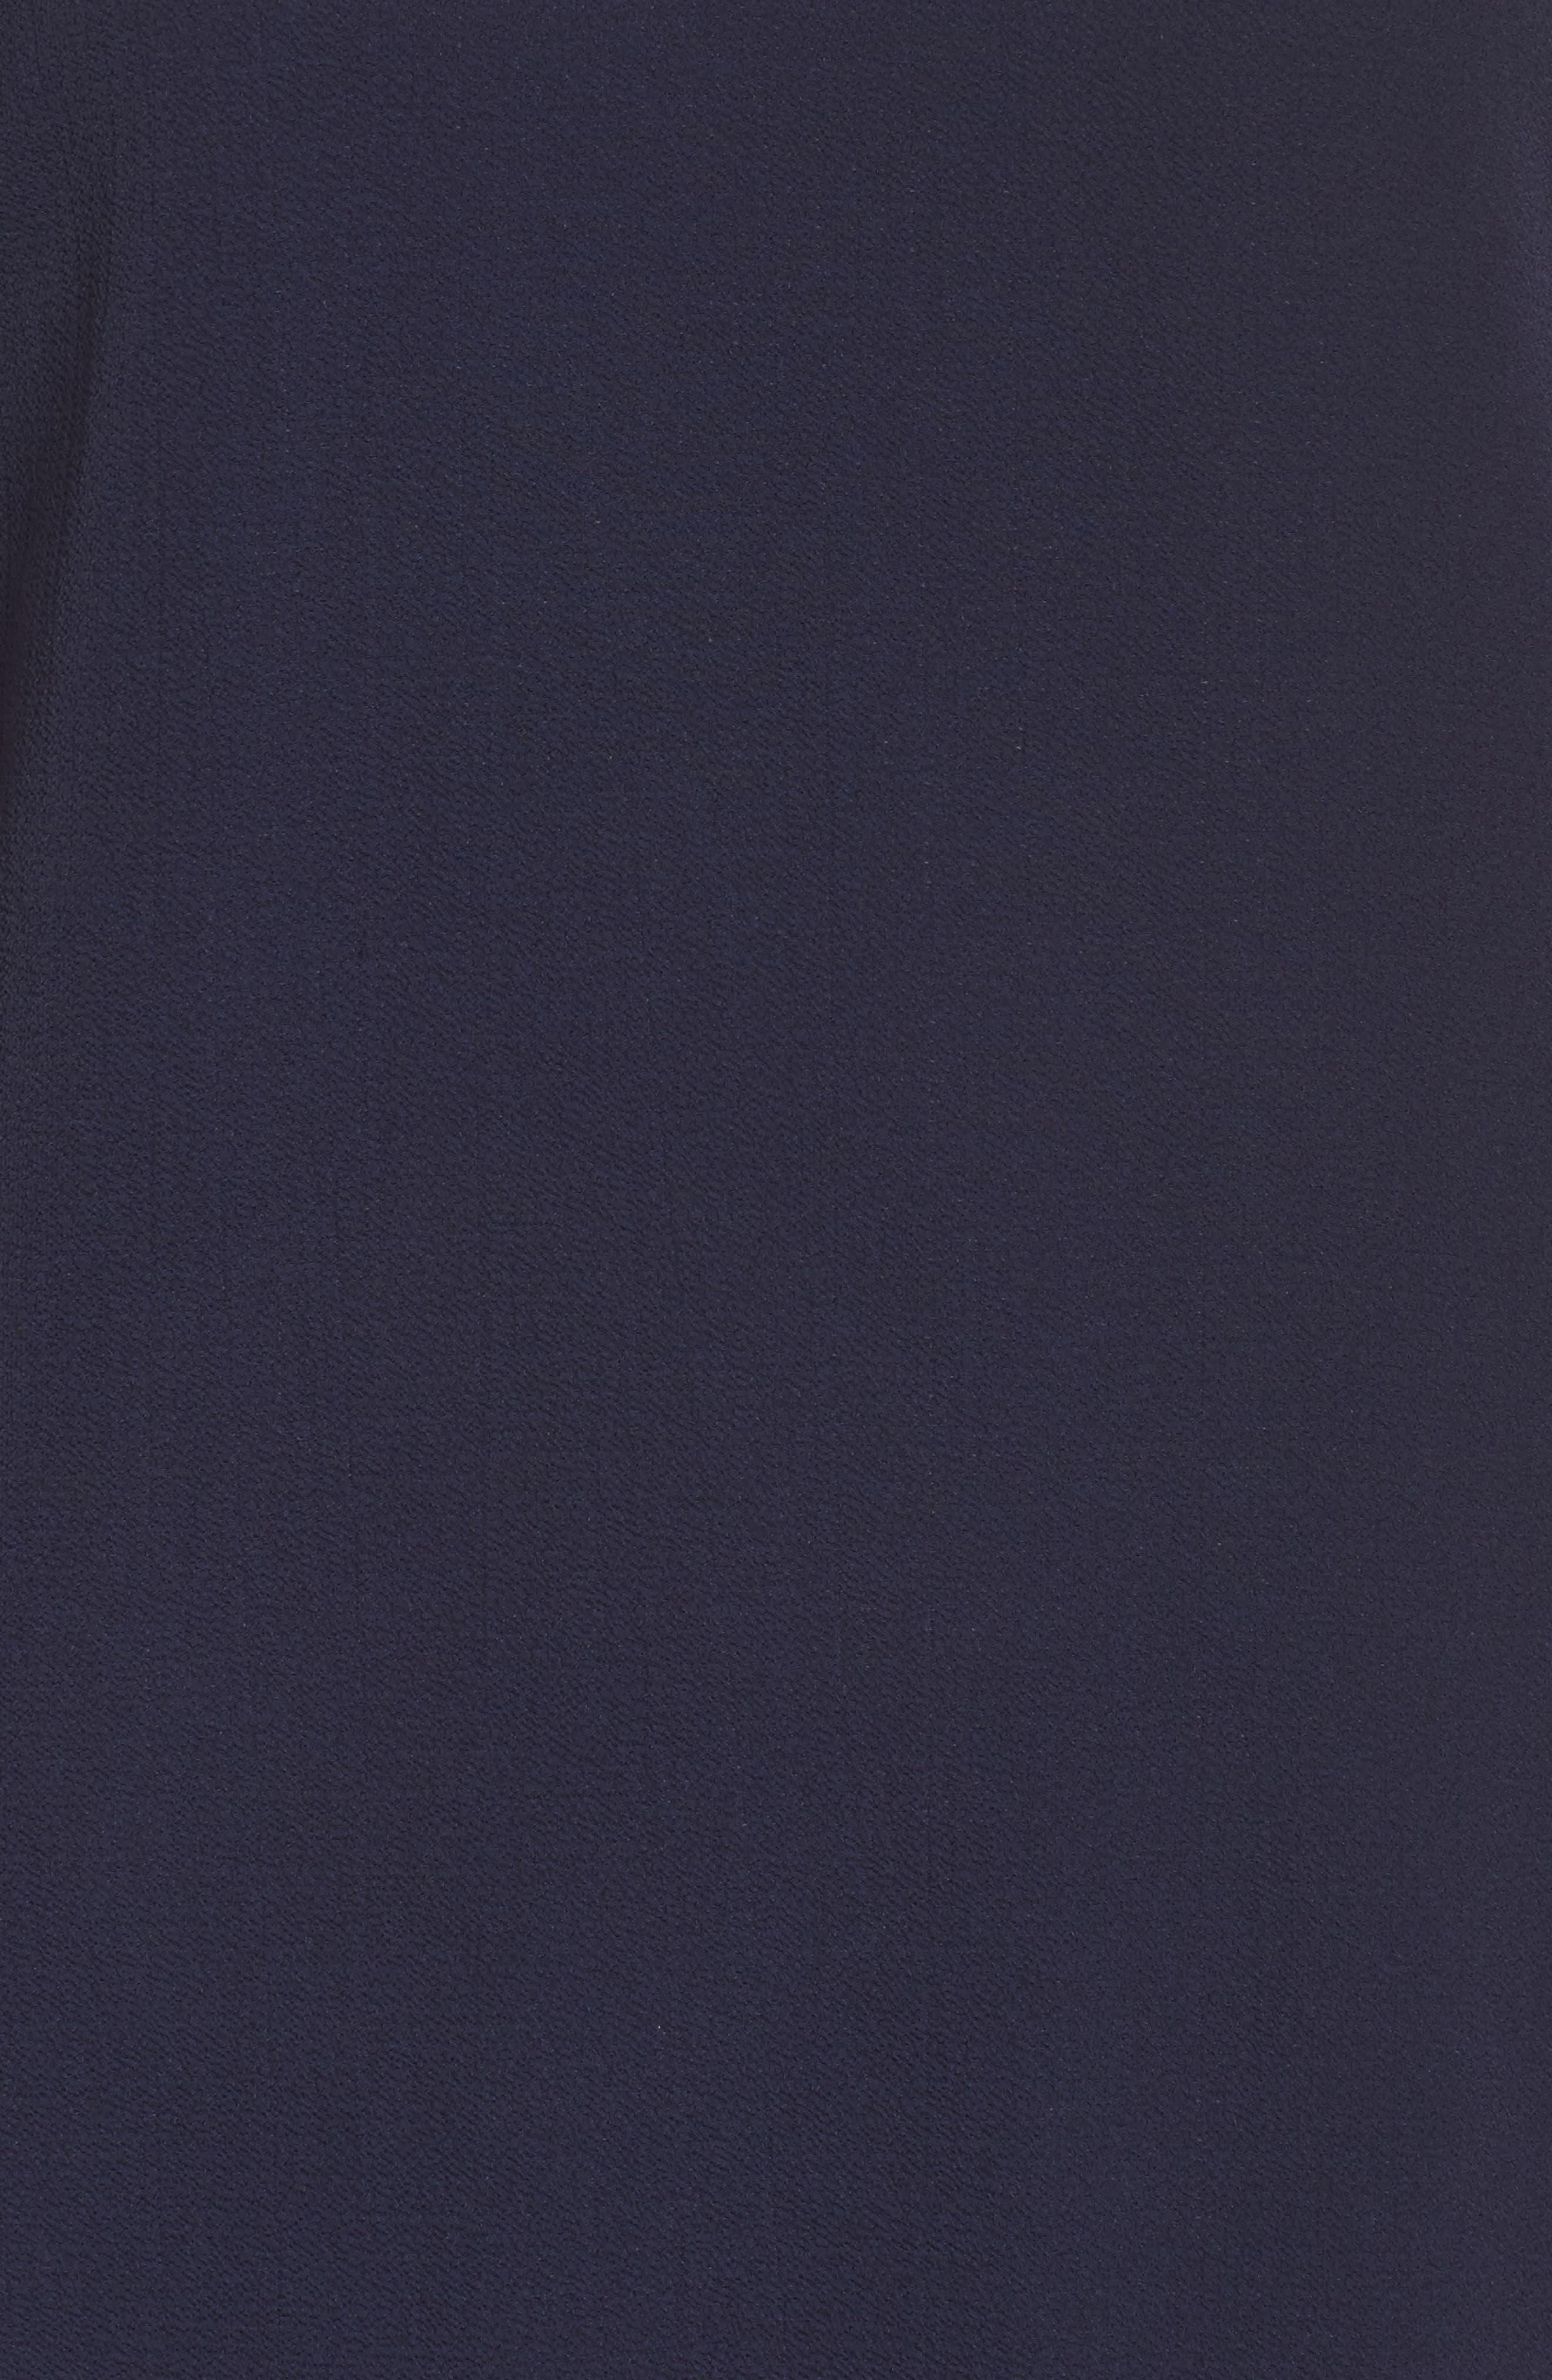 V-Back Shift Dress,                             Alternate thumbnail 6, color,                             410